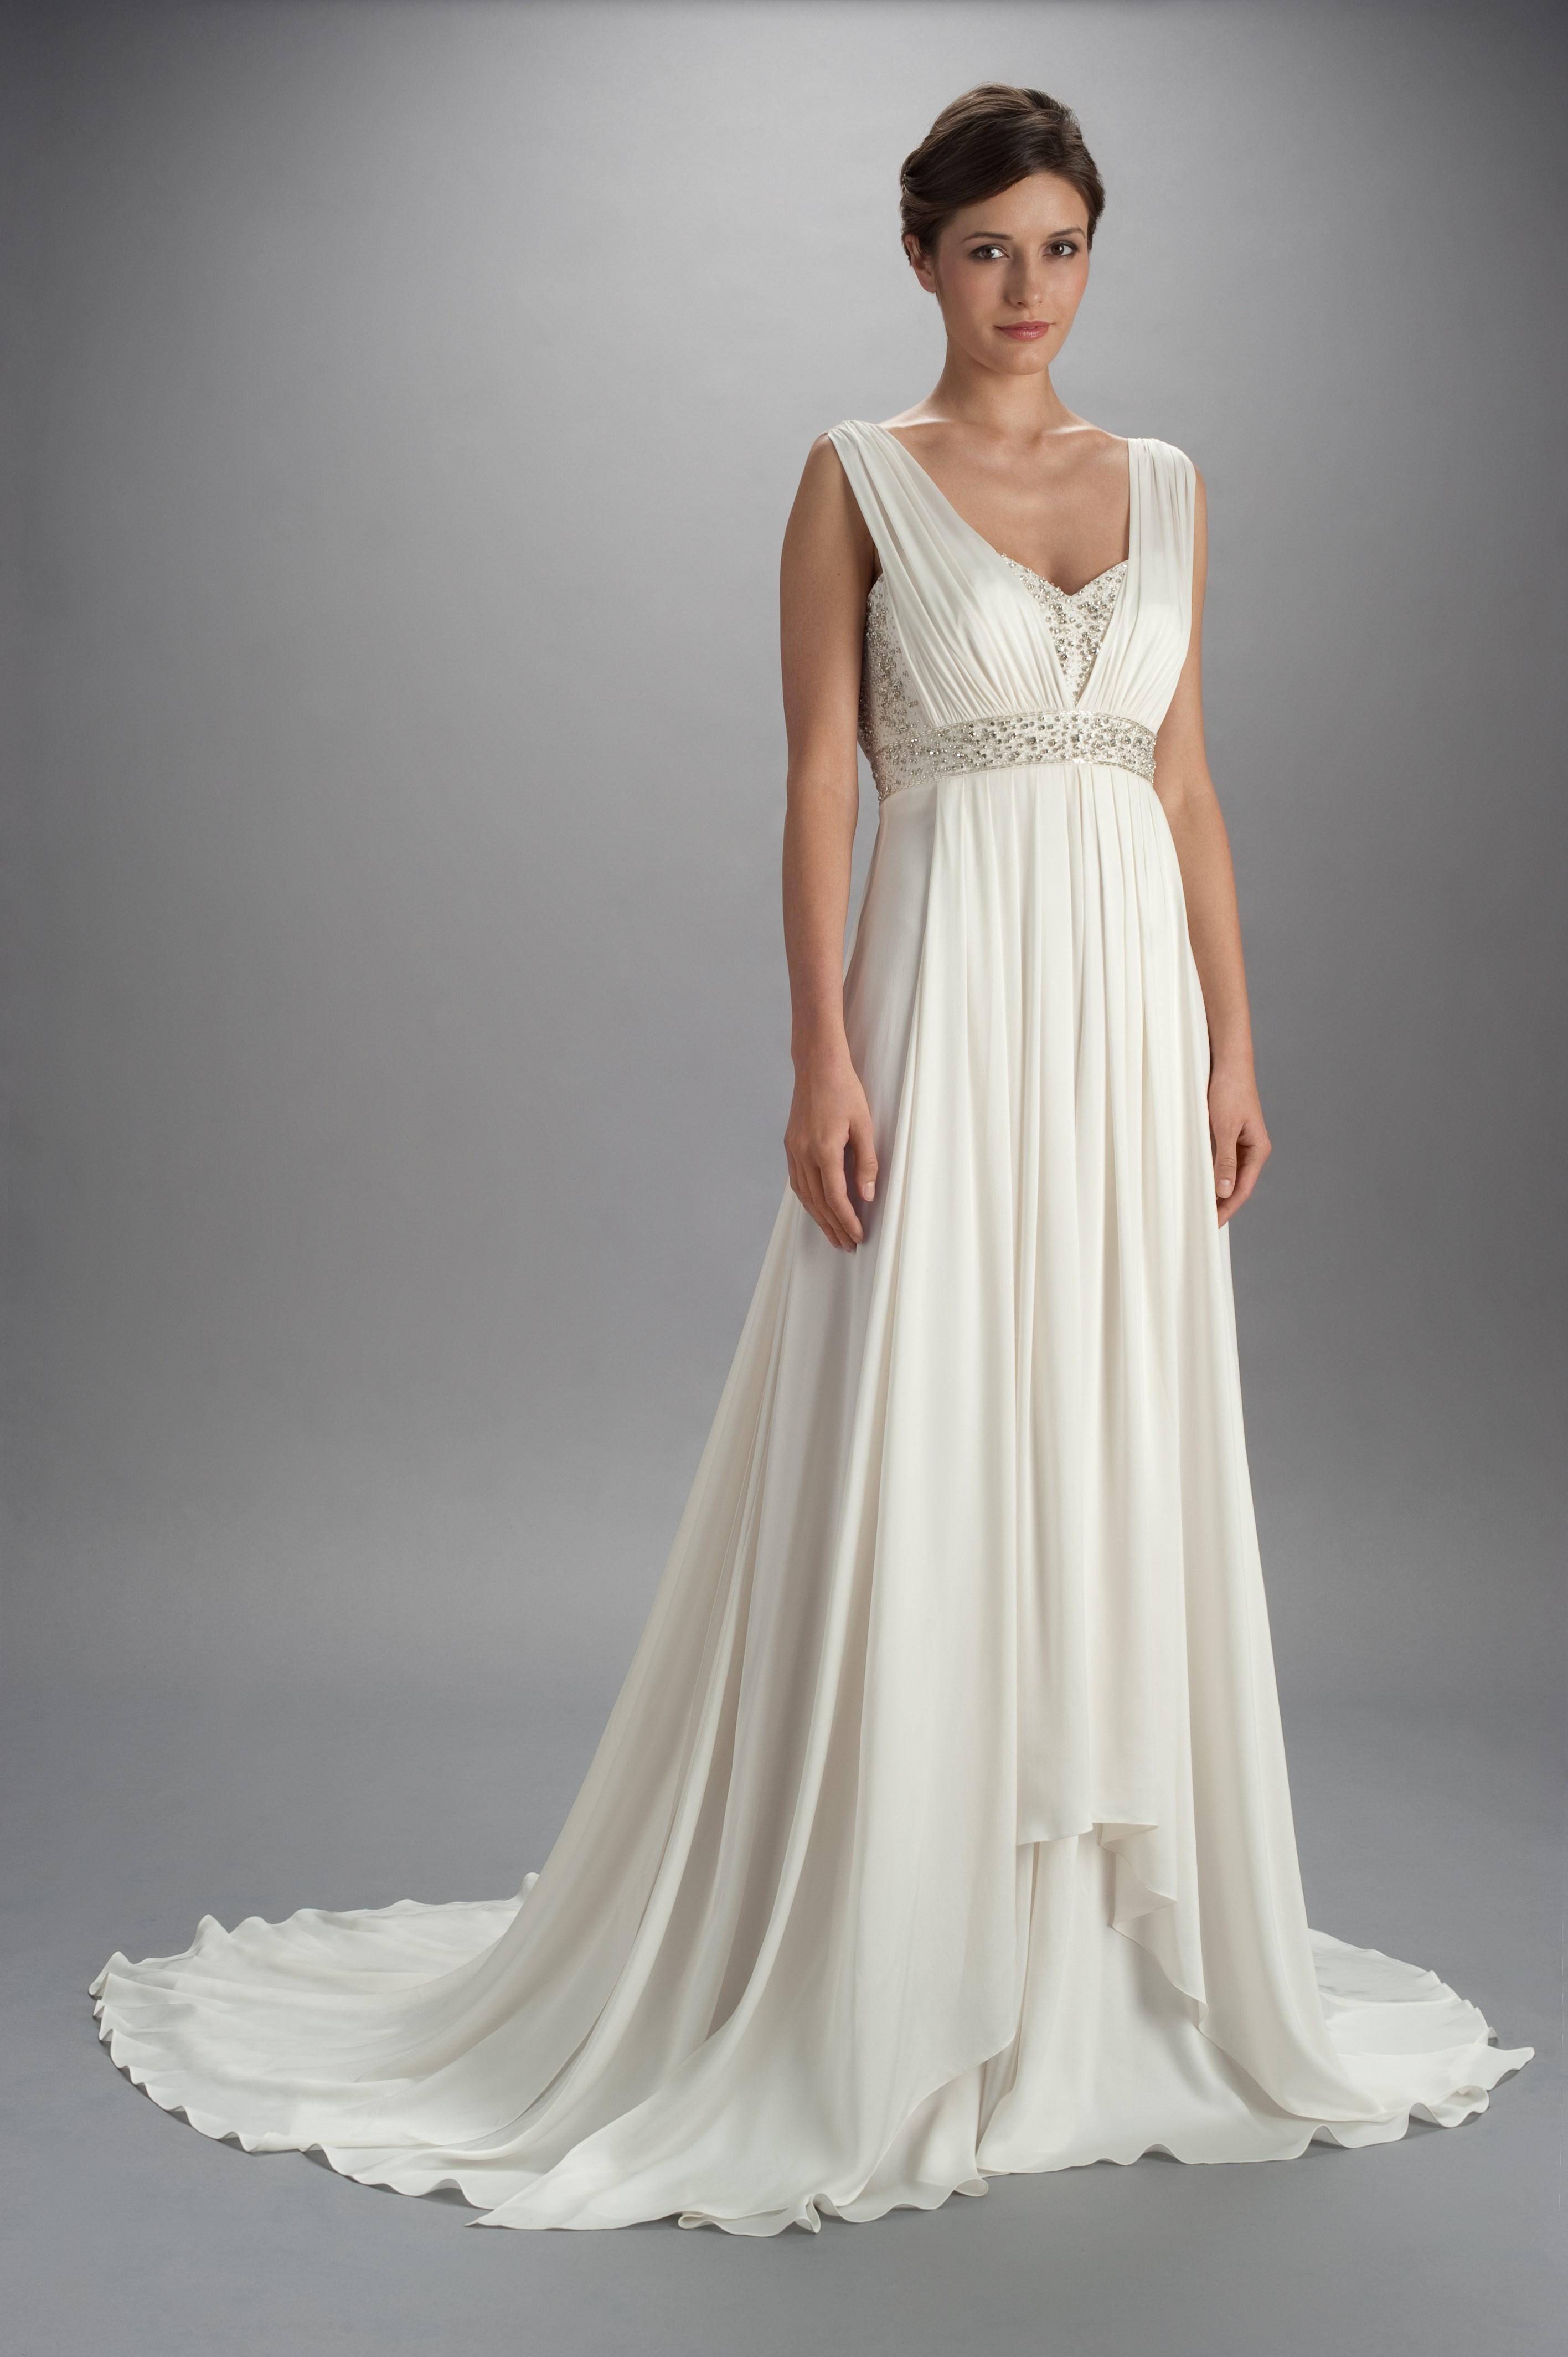 Clementine Wedding Dress by Amanda Wakeley   Northern Ireland